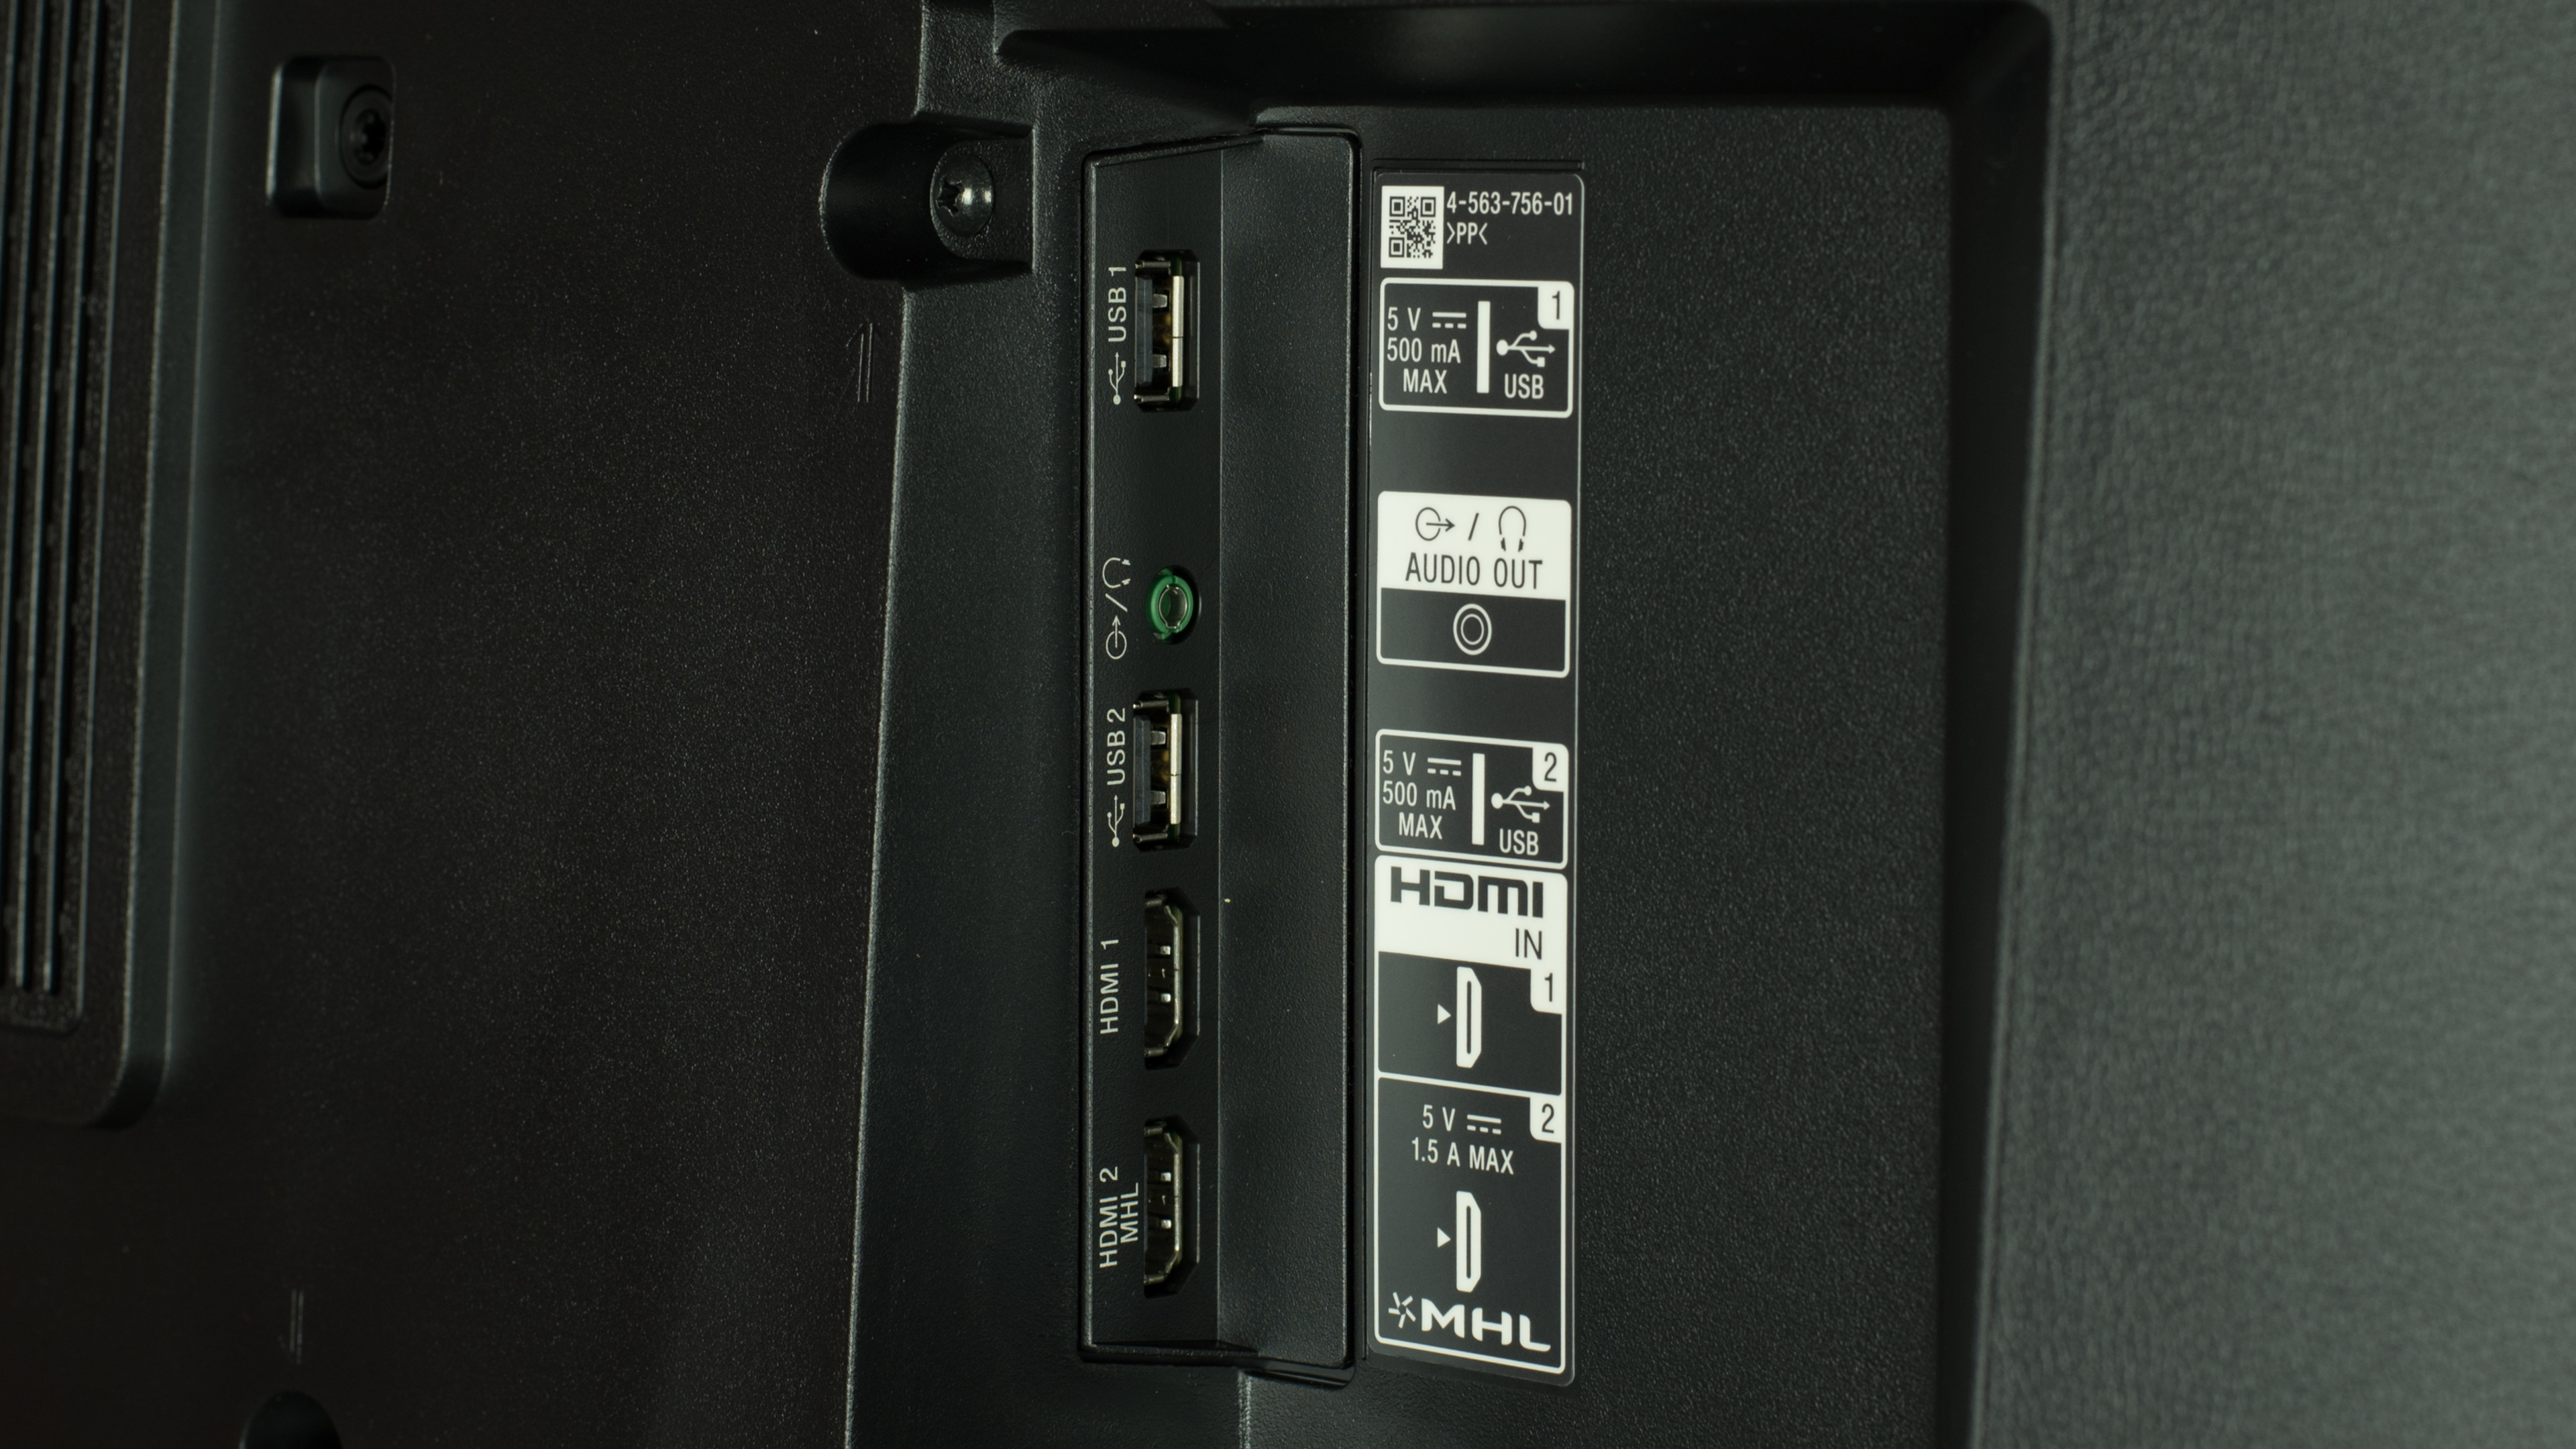 Sony X930c Review  Xbr65x930c